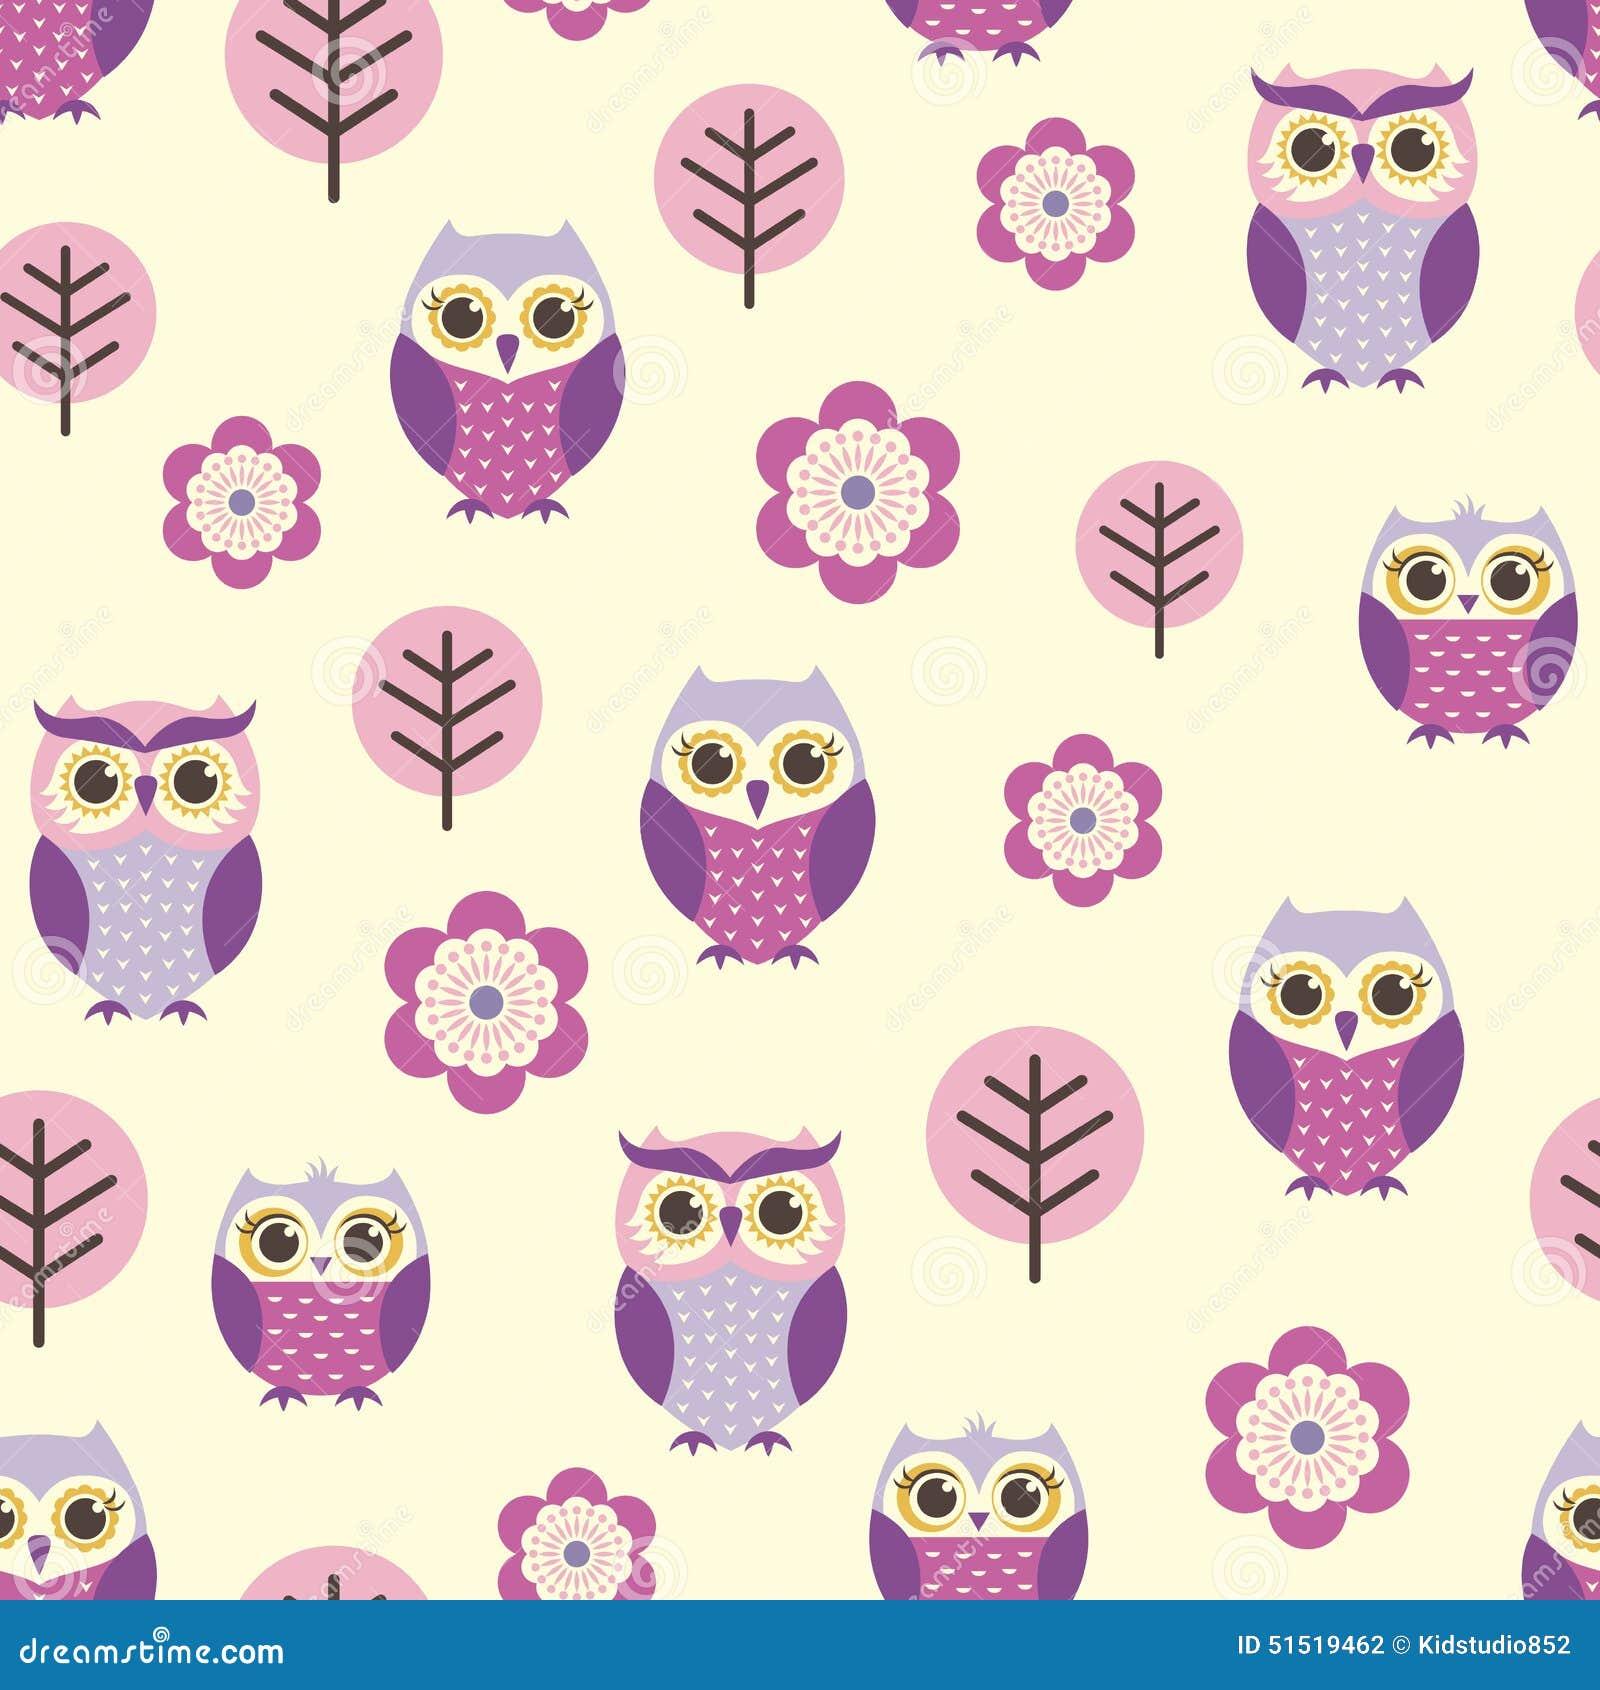 Seamless Cartoon Owls Pattern Stock Vector - Image: 51519462